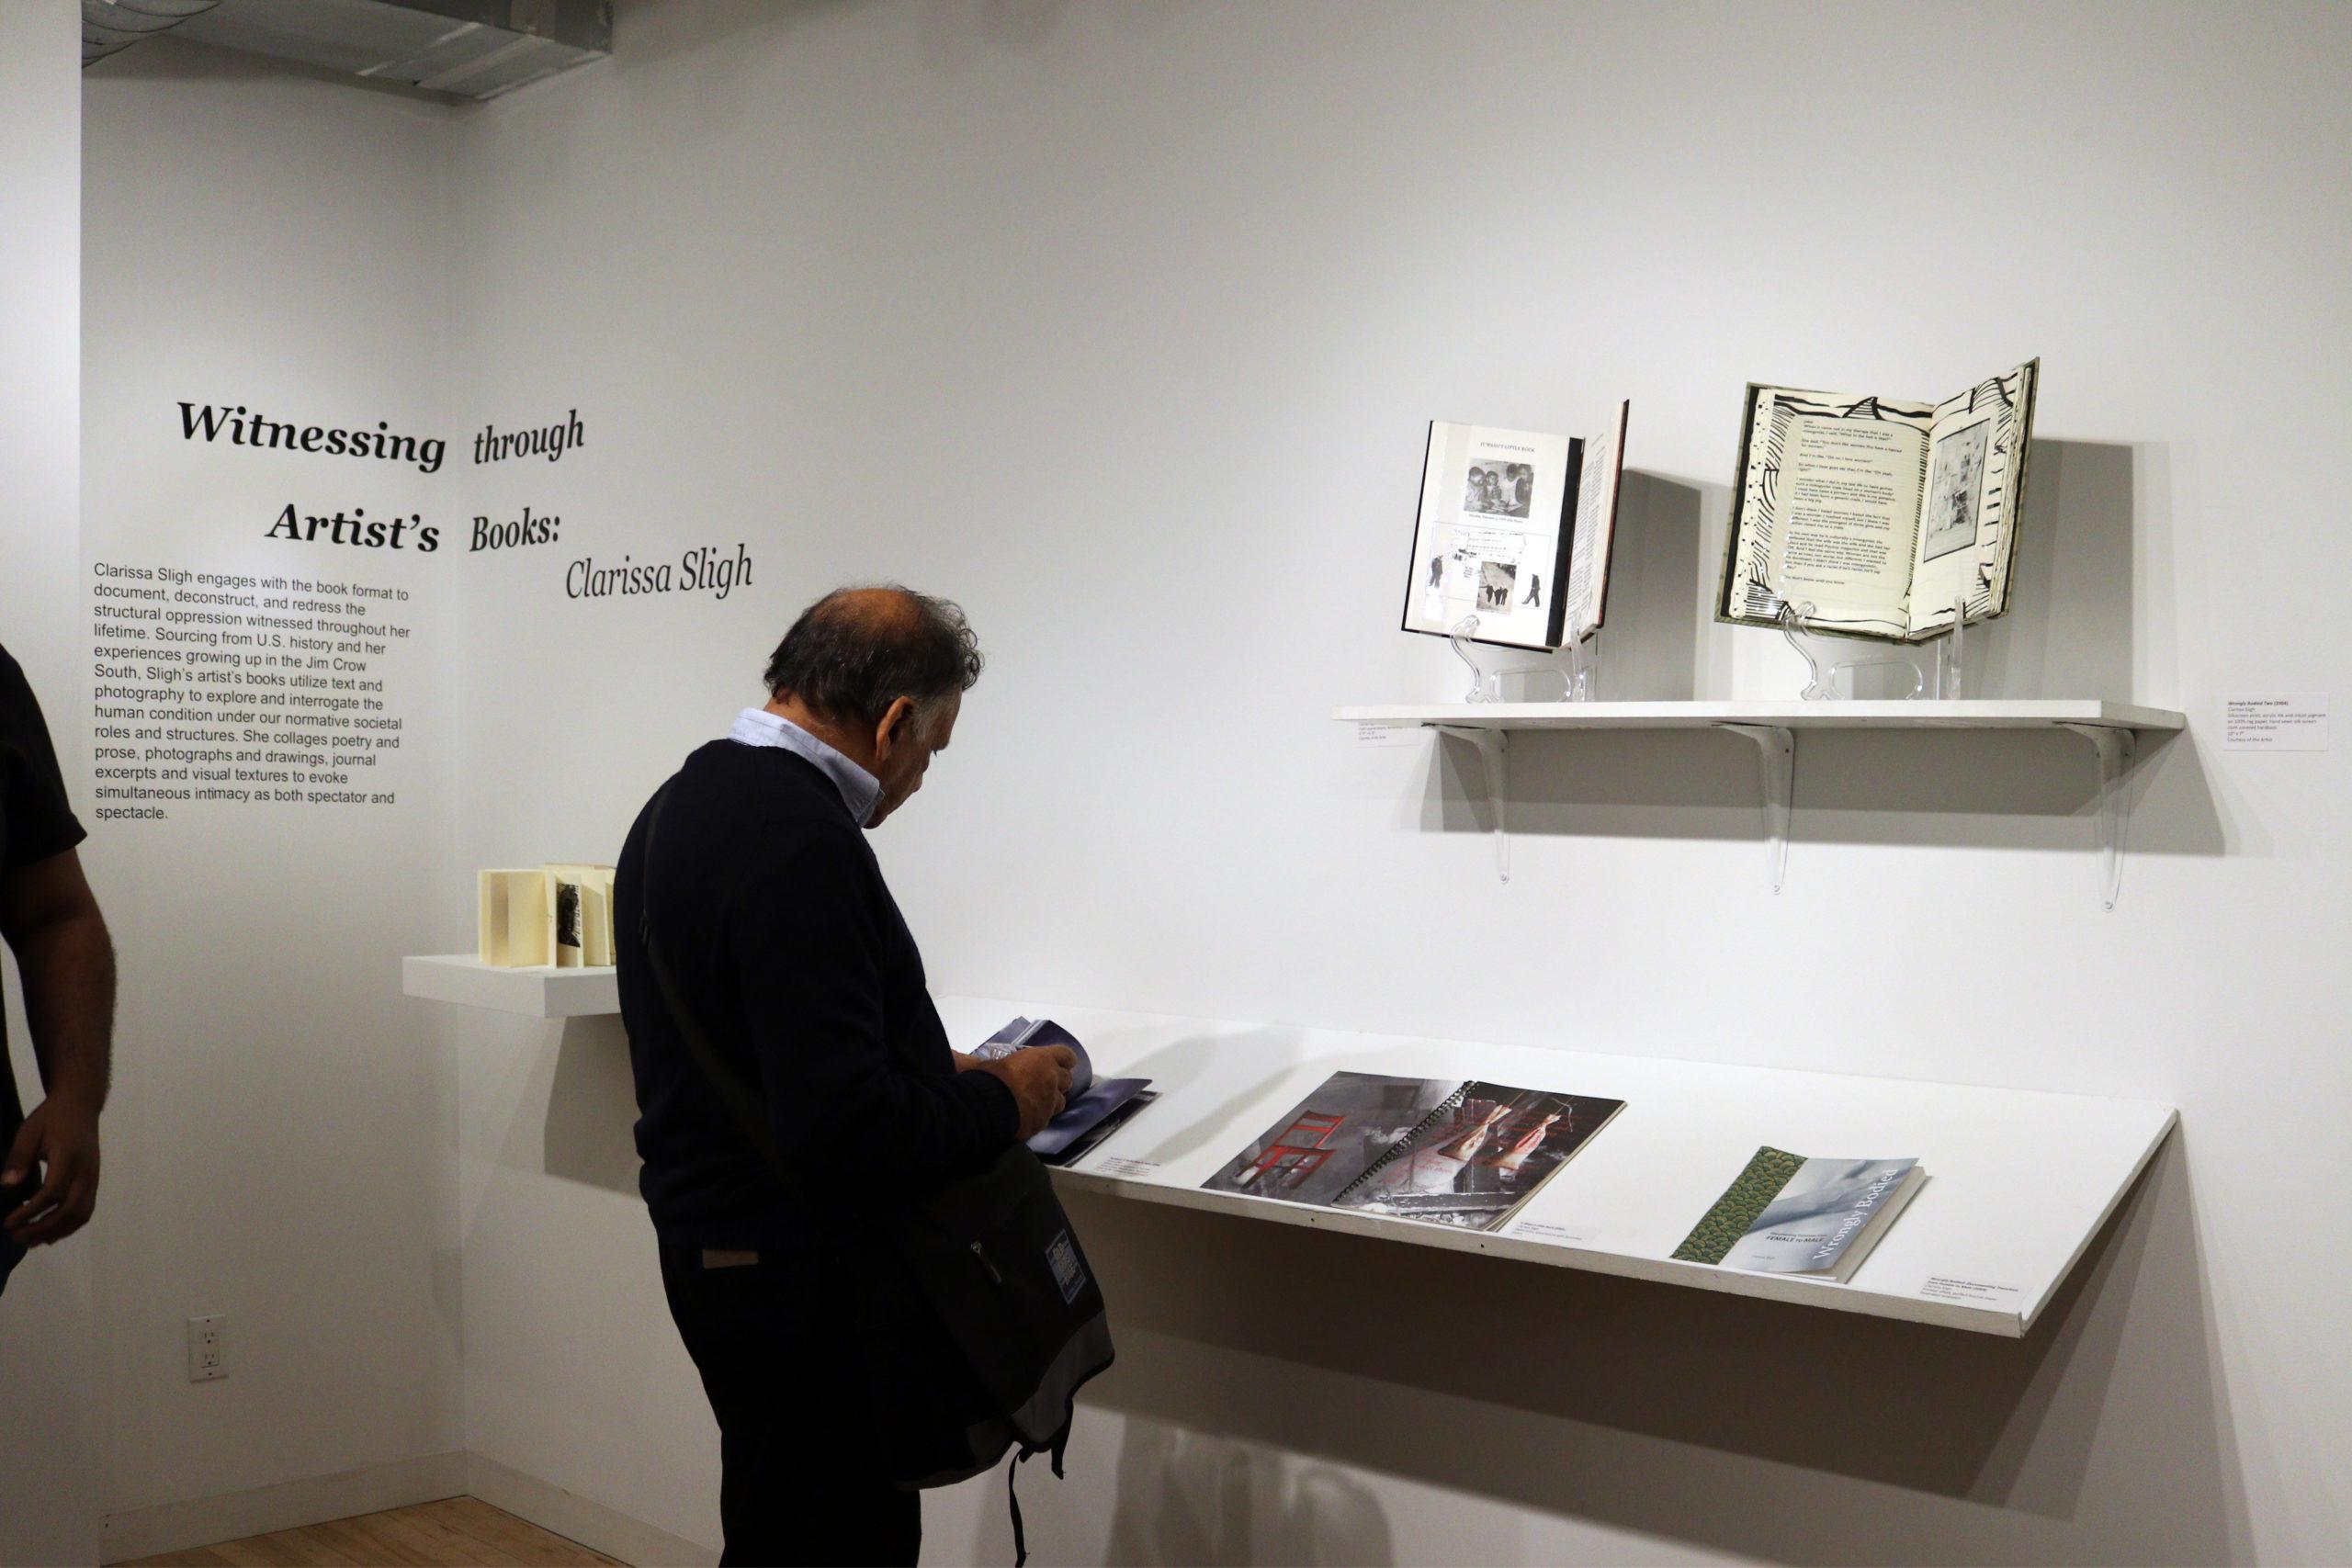 man looks at books by Clarissa Sligh